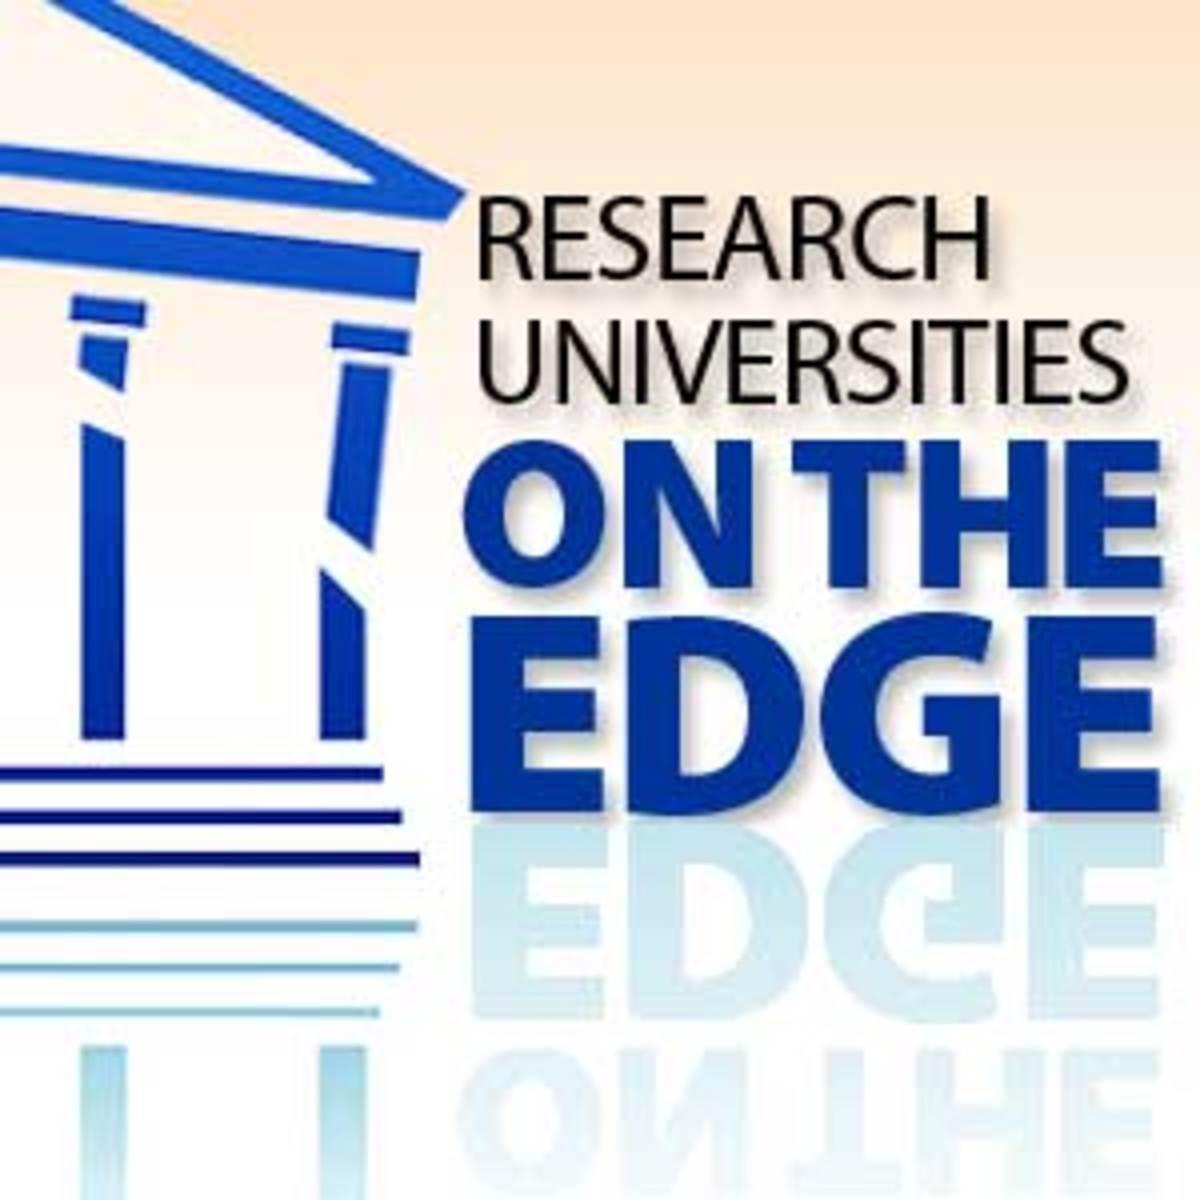 researchlogo